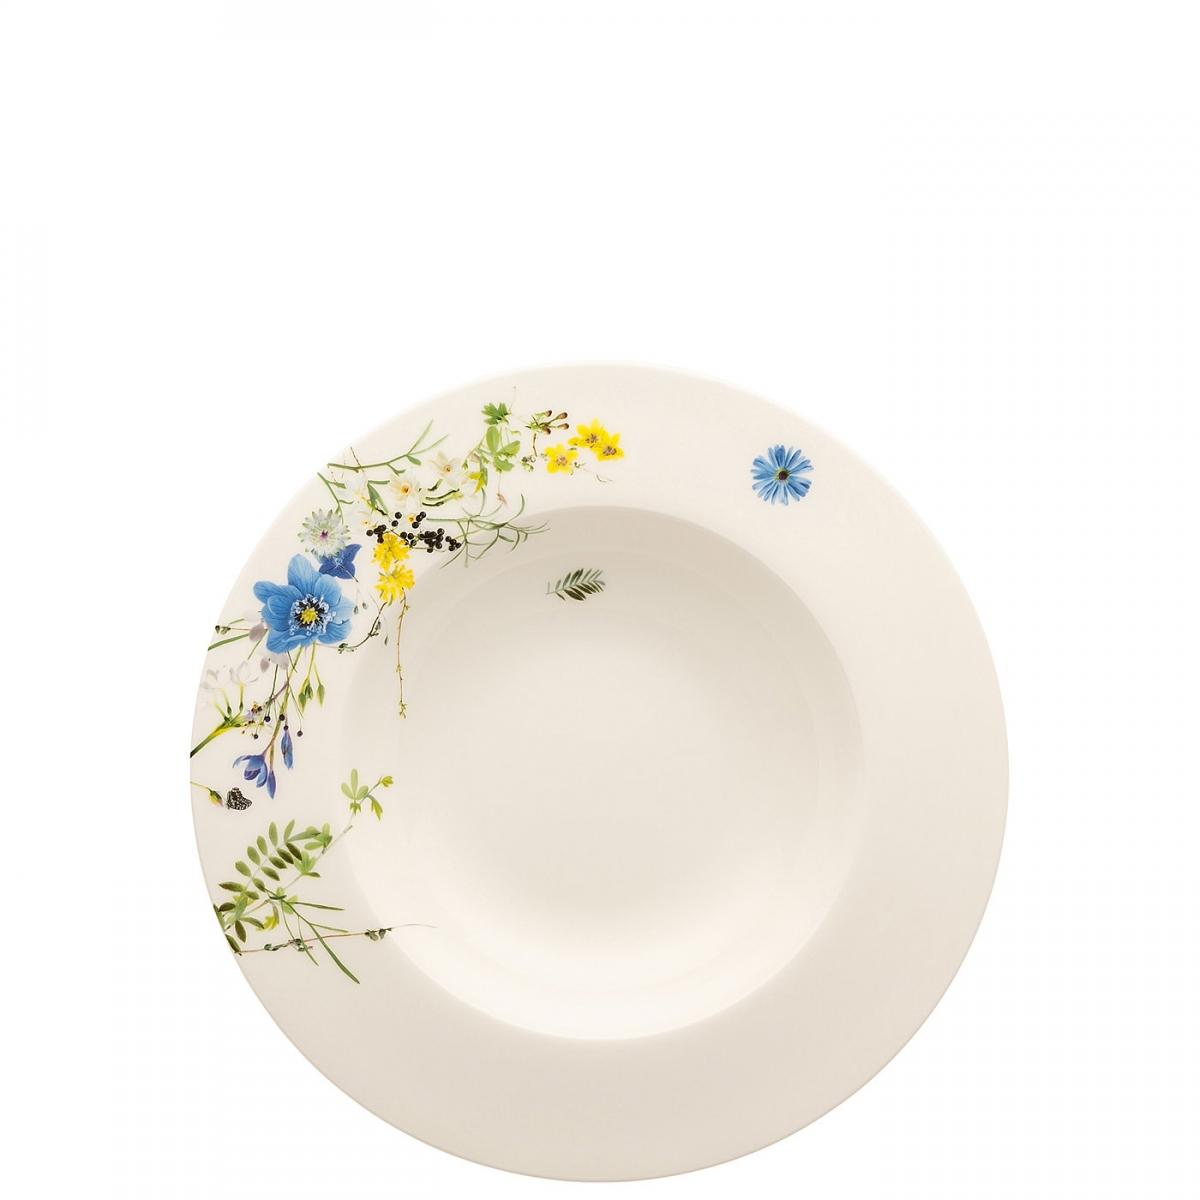 rosenthal selection brillance fleurs sauvages тарелка coup 27 см Тарелка суповая с бортом Rosenthal Альпийские цветы 23 см